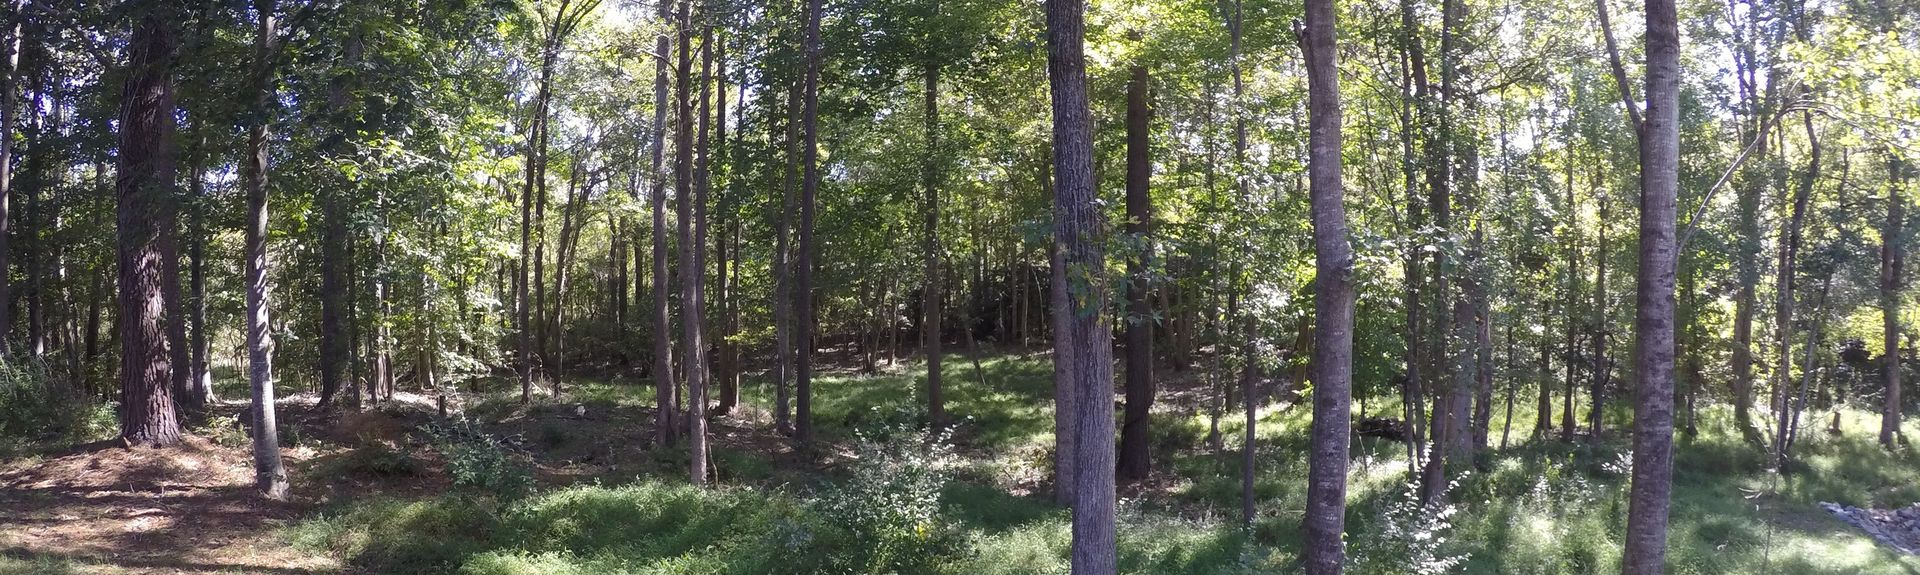 Wake Forest, NC, USA